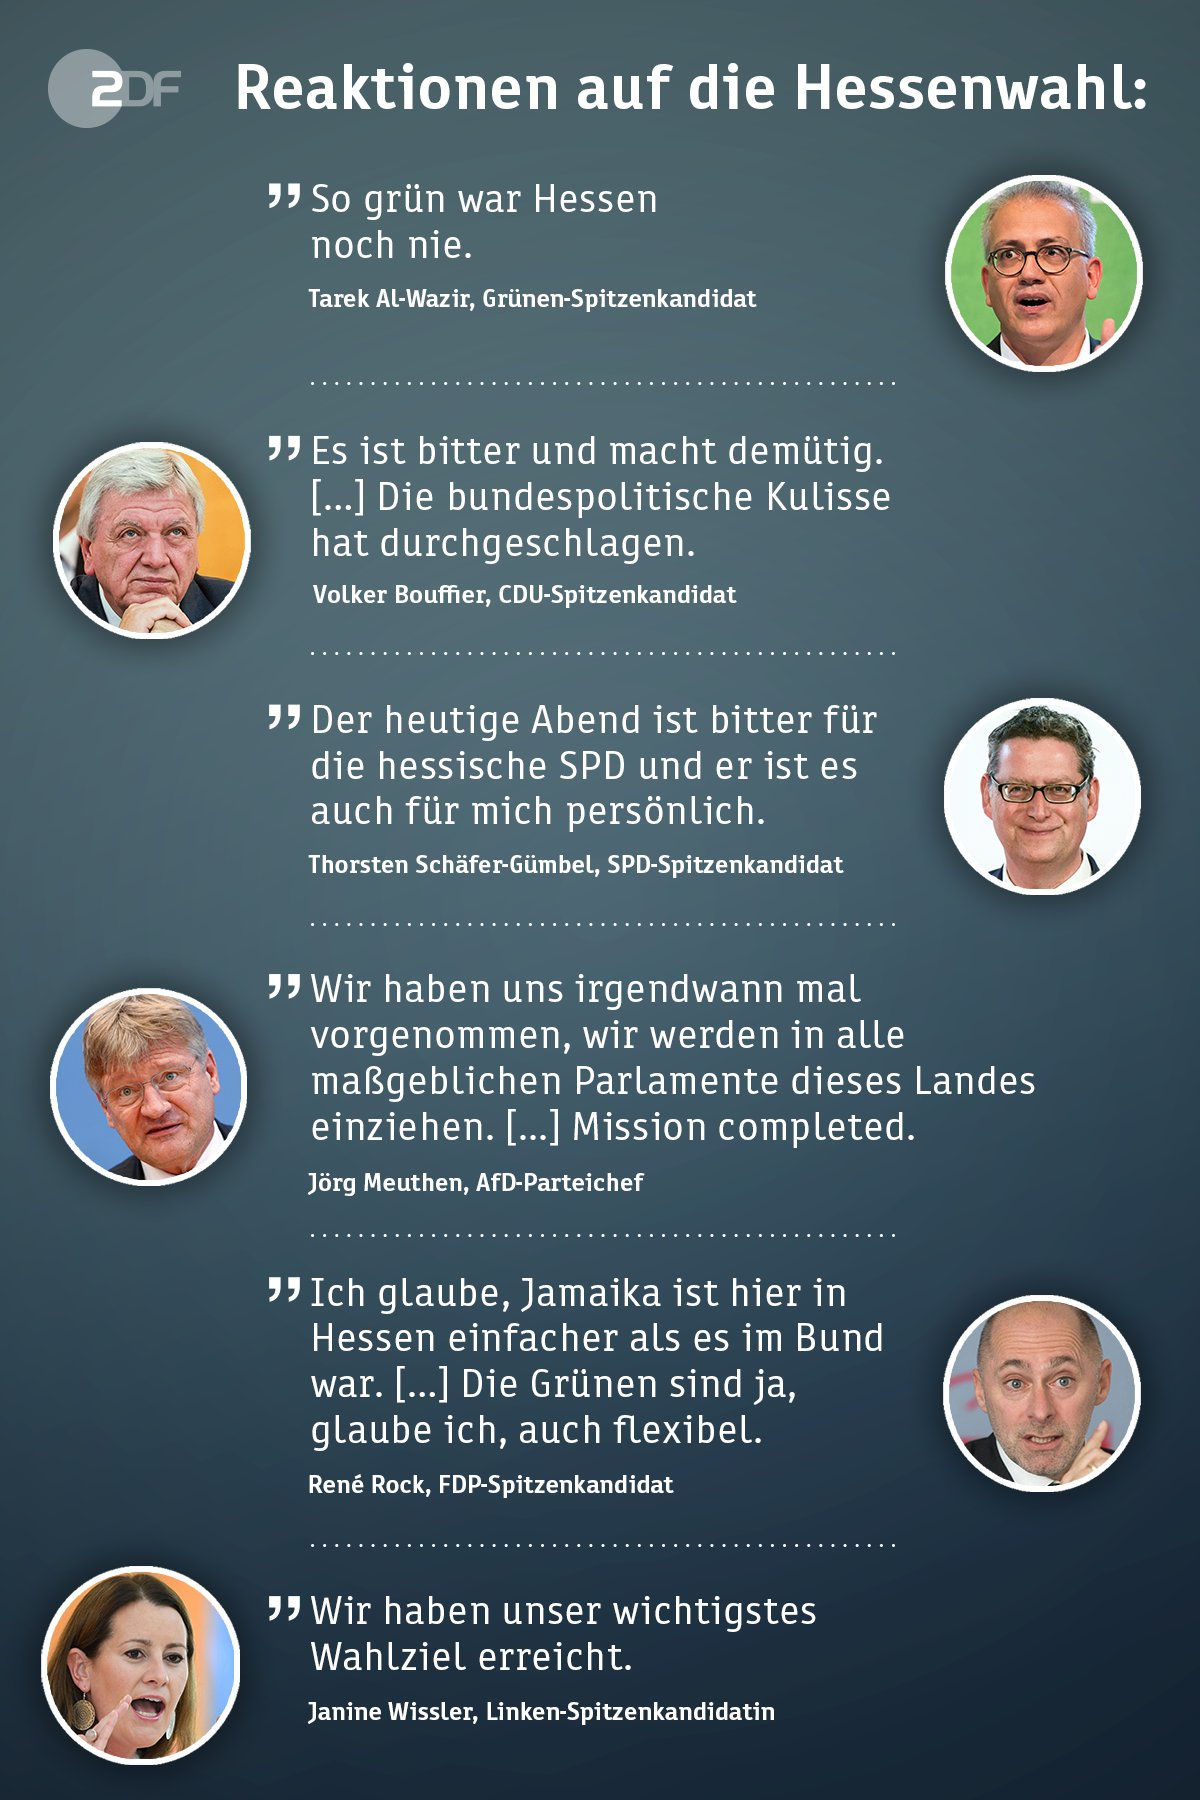 Zdf Hessenwahl